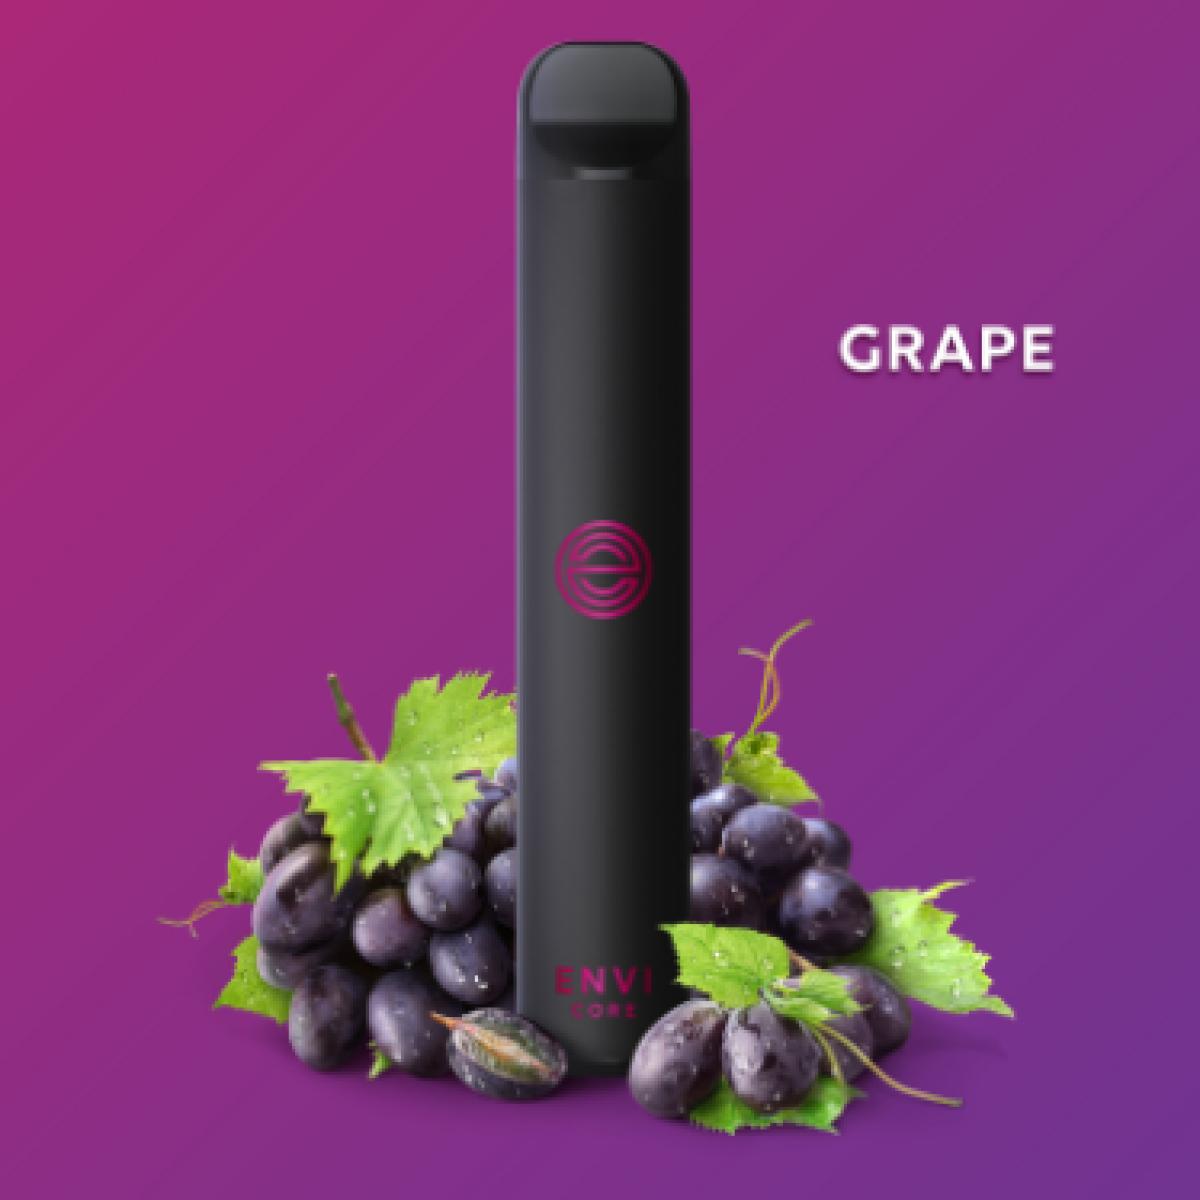 Grape Envi